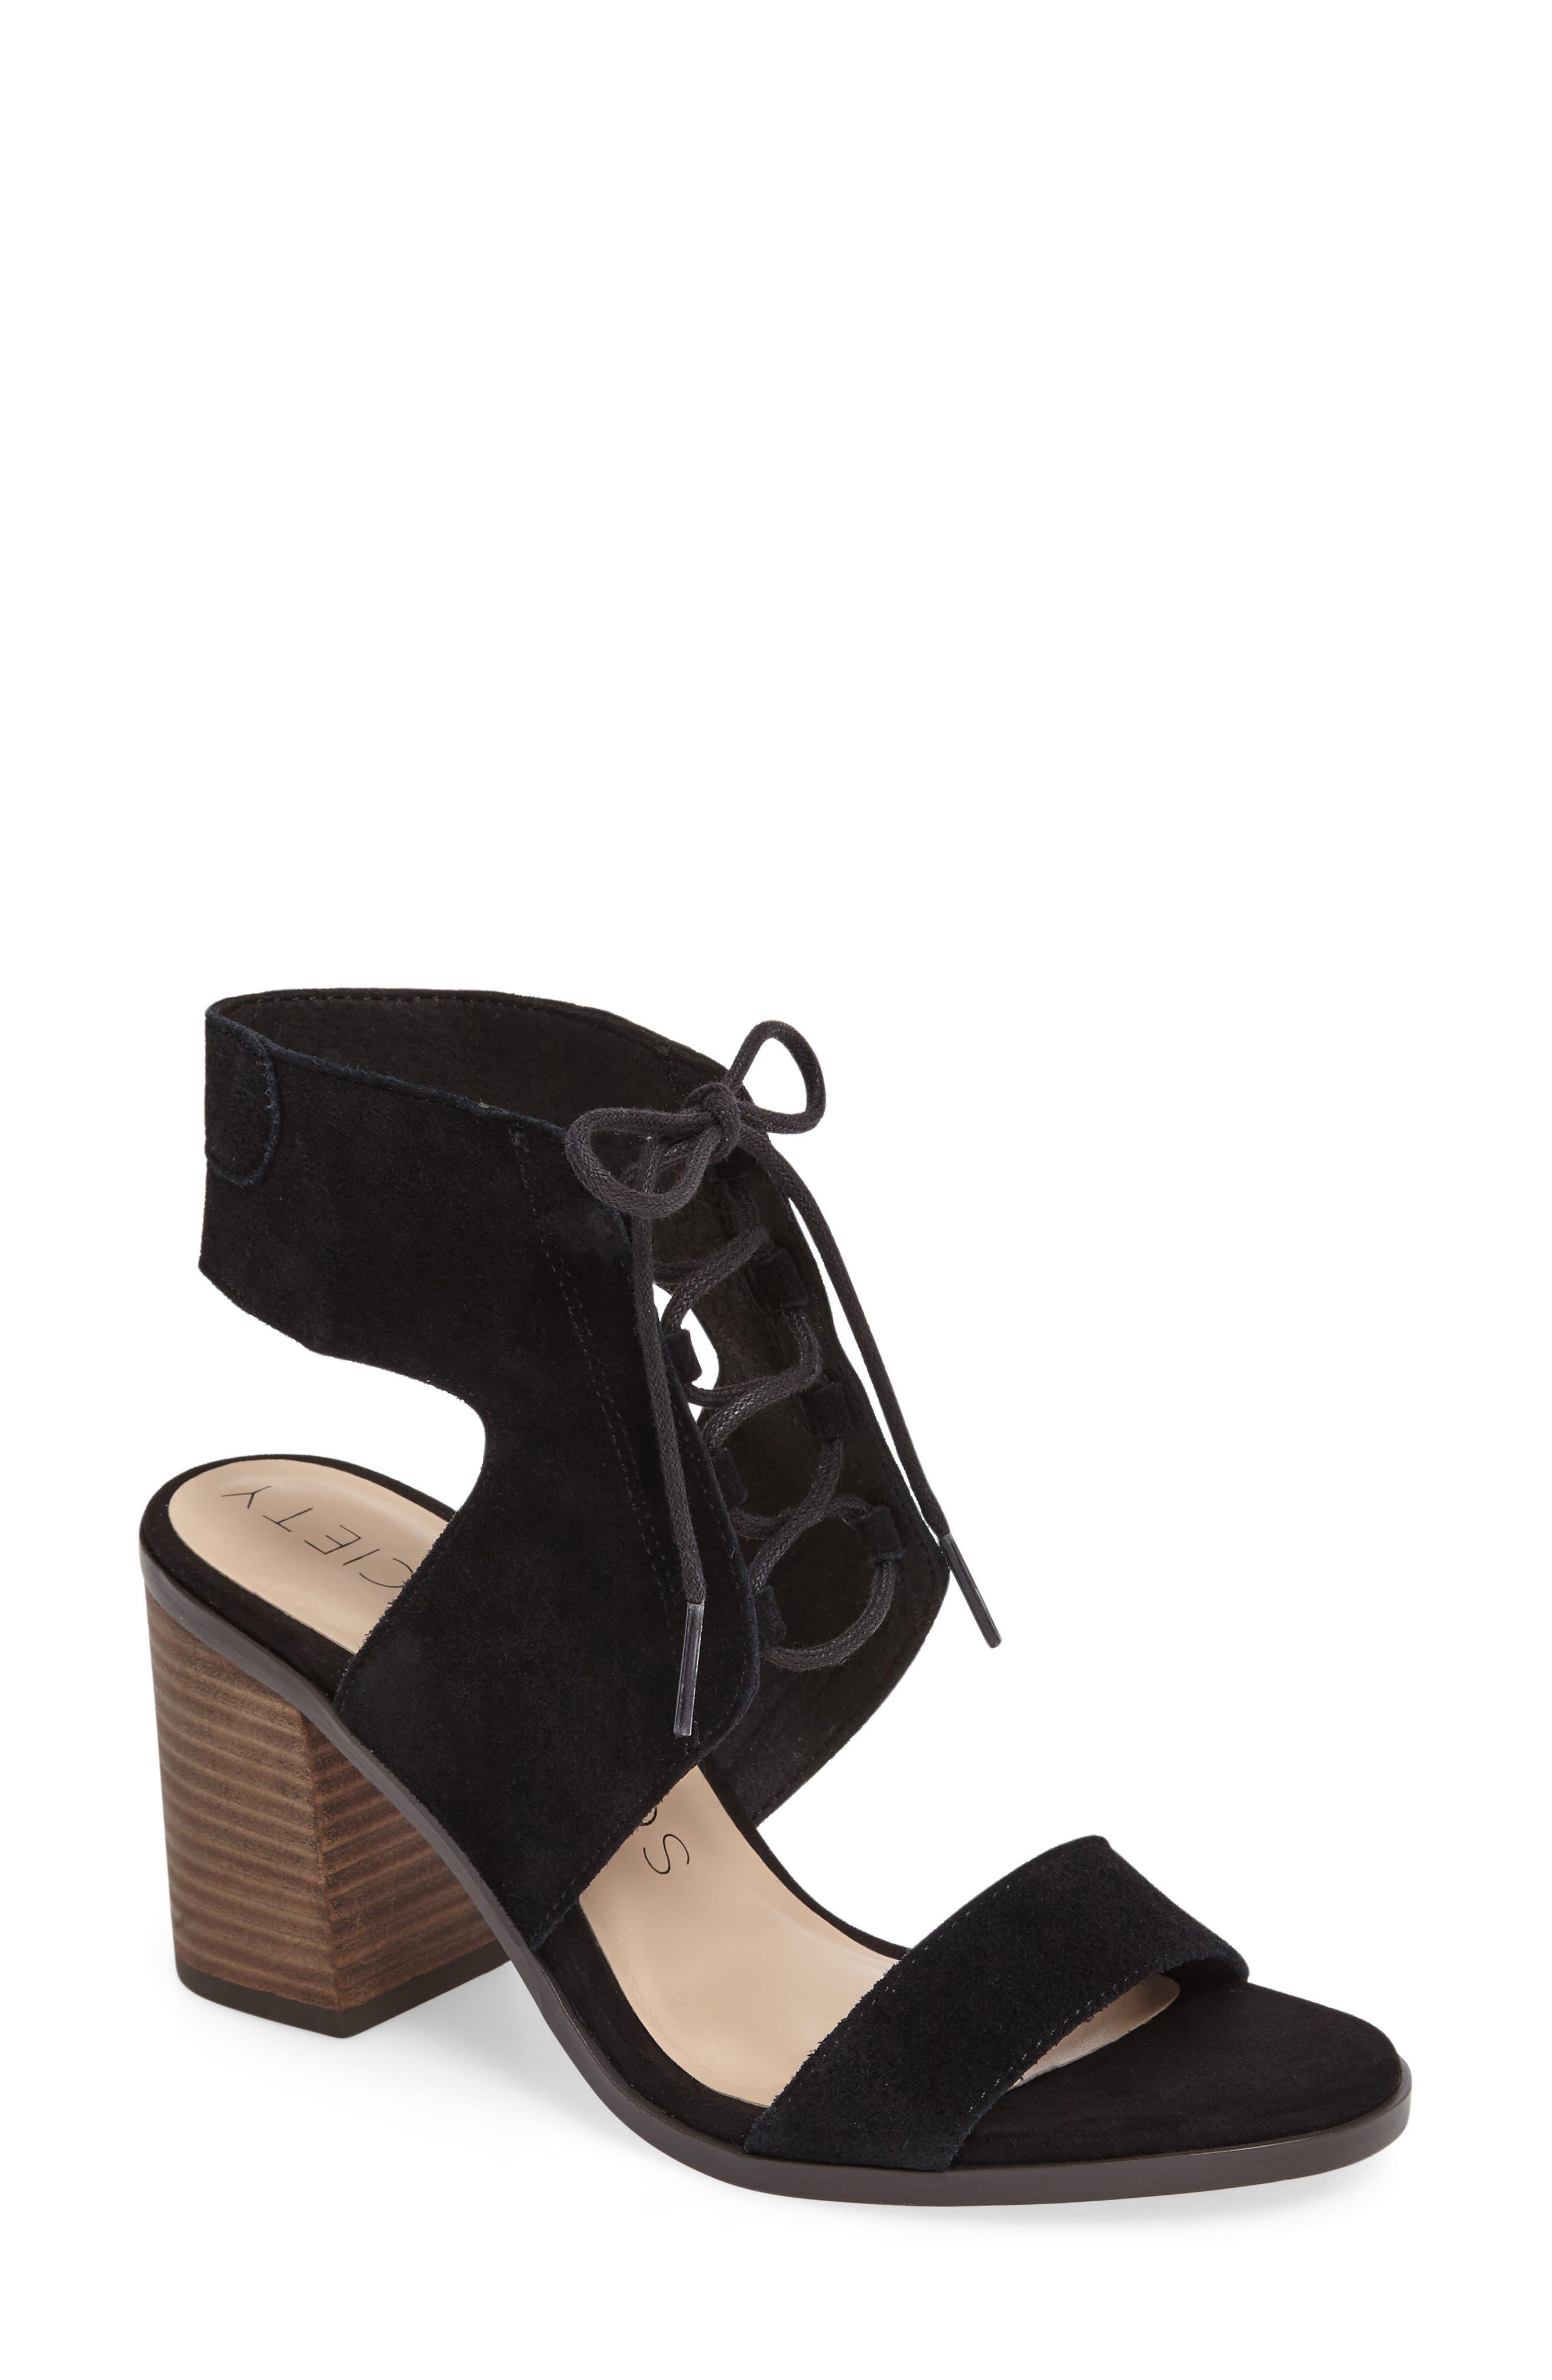 Main Image - Sole Society Auburn Lace-Up Sandal (Women)